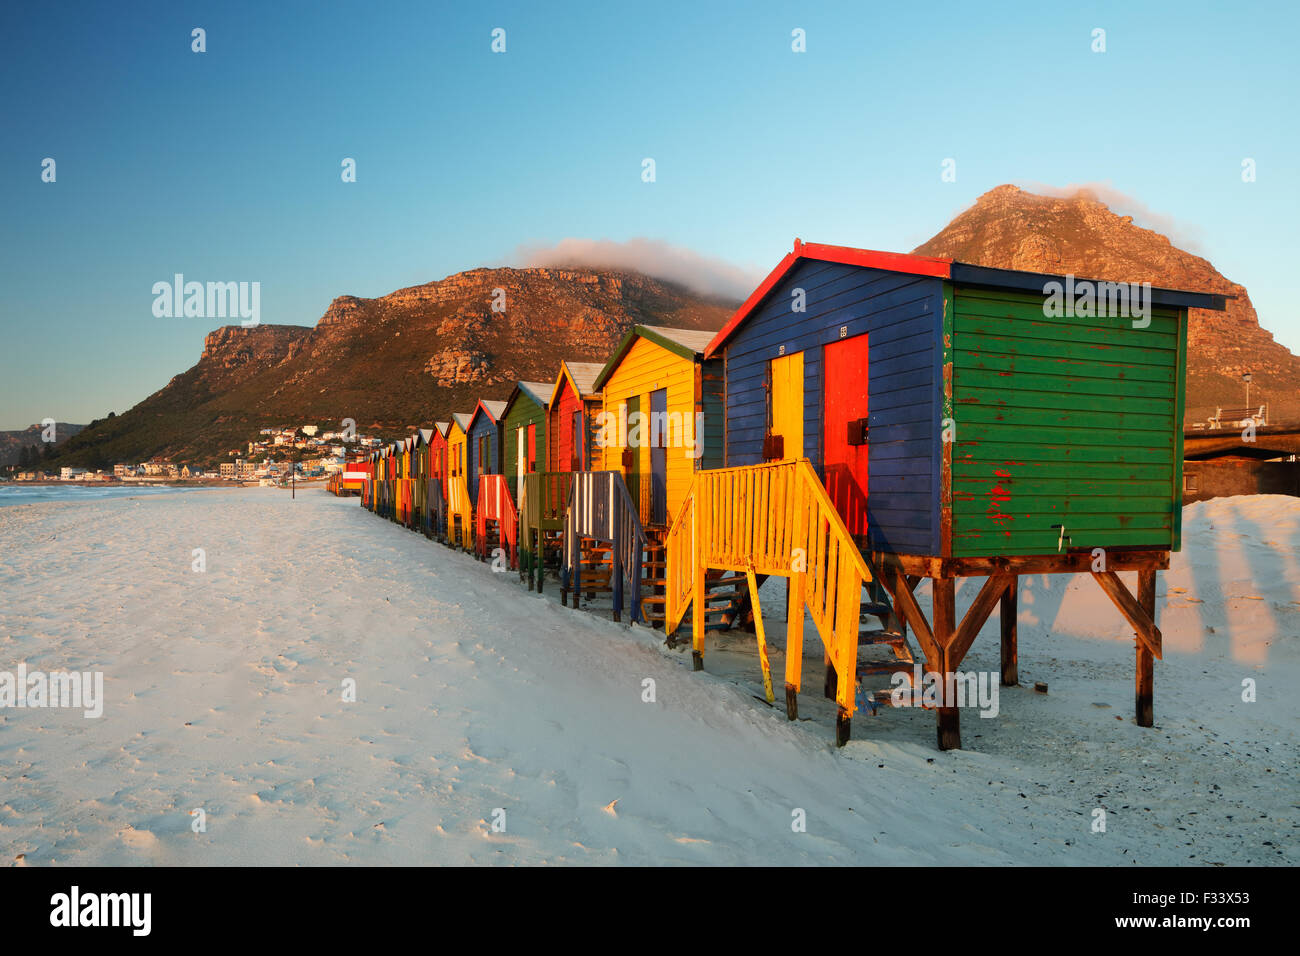 Cabañas de playa en Muizenberg, Western Cape, Sudáfrica Imagen De Stock